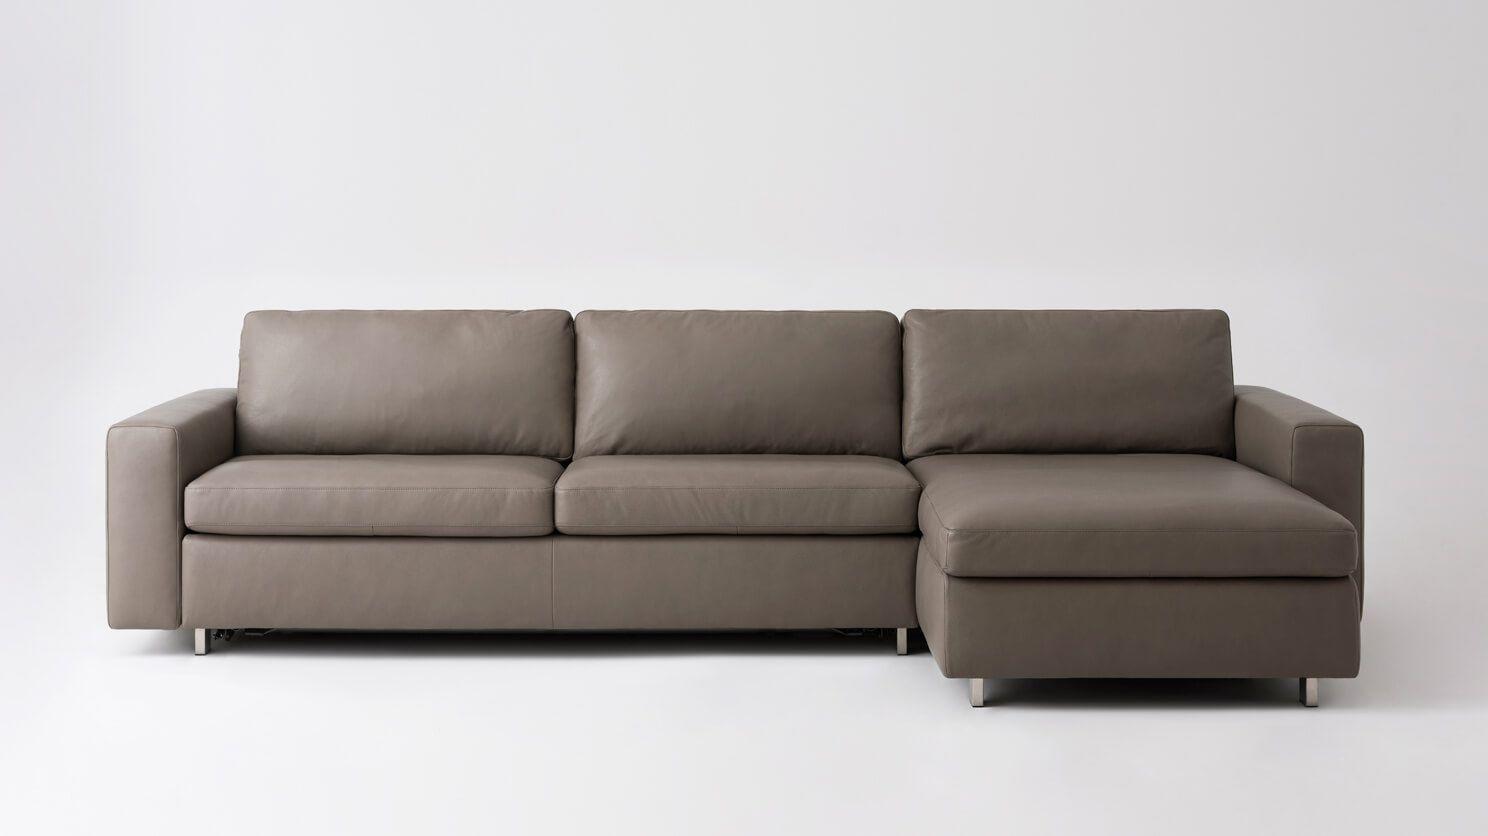 Reva 2 Piece Sectional Sleeper Sofa With Storage Chaise Leather Eq3 Sectional Sleeper Sofa Sleeper Sofa Queen Sofa Sleeper